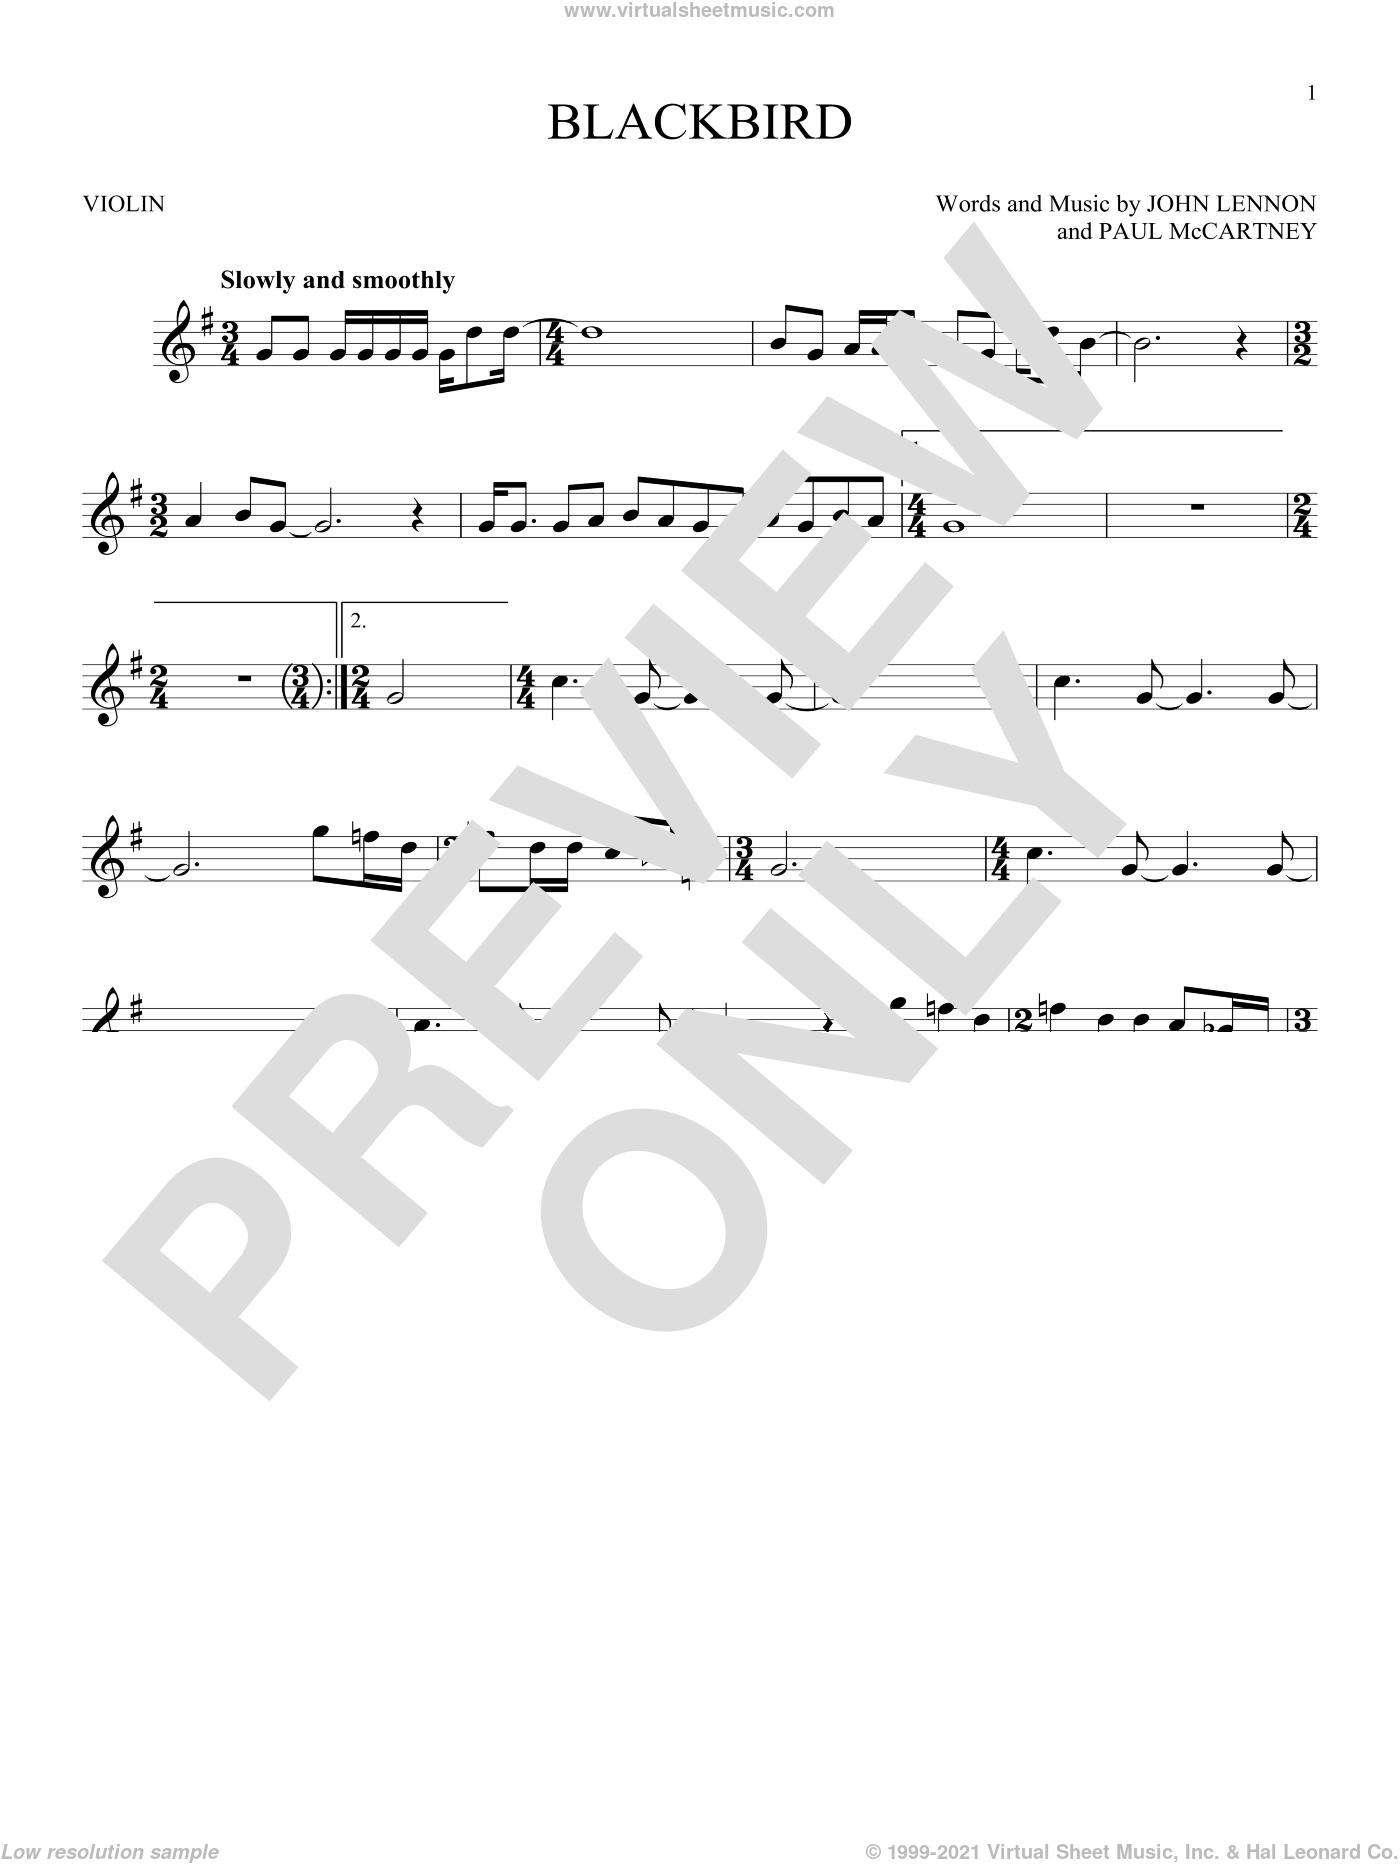 Blackbird sheet music for violin solo by The Beatles, Wings, John Lennon and Paul McCartney, intermediate skill level